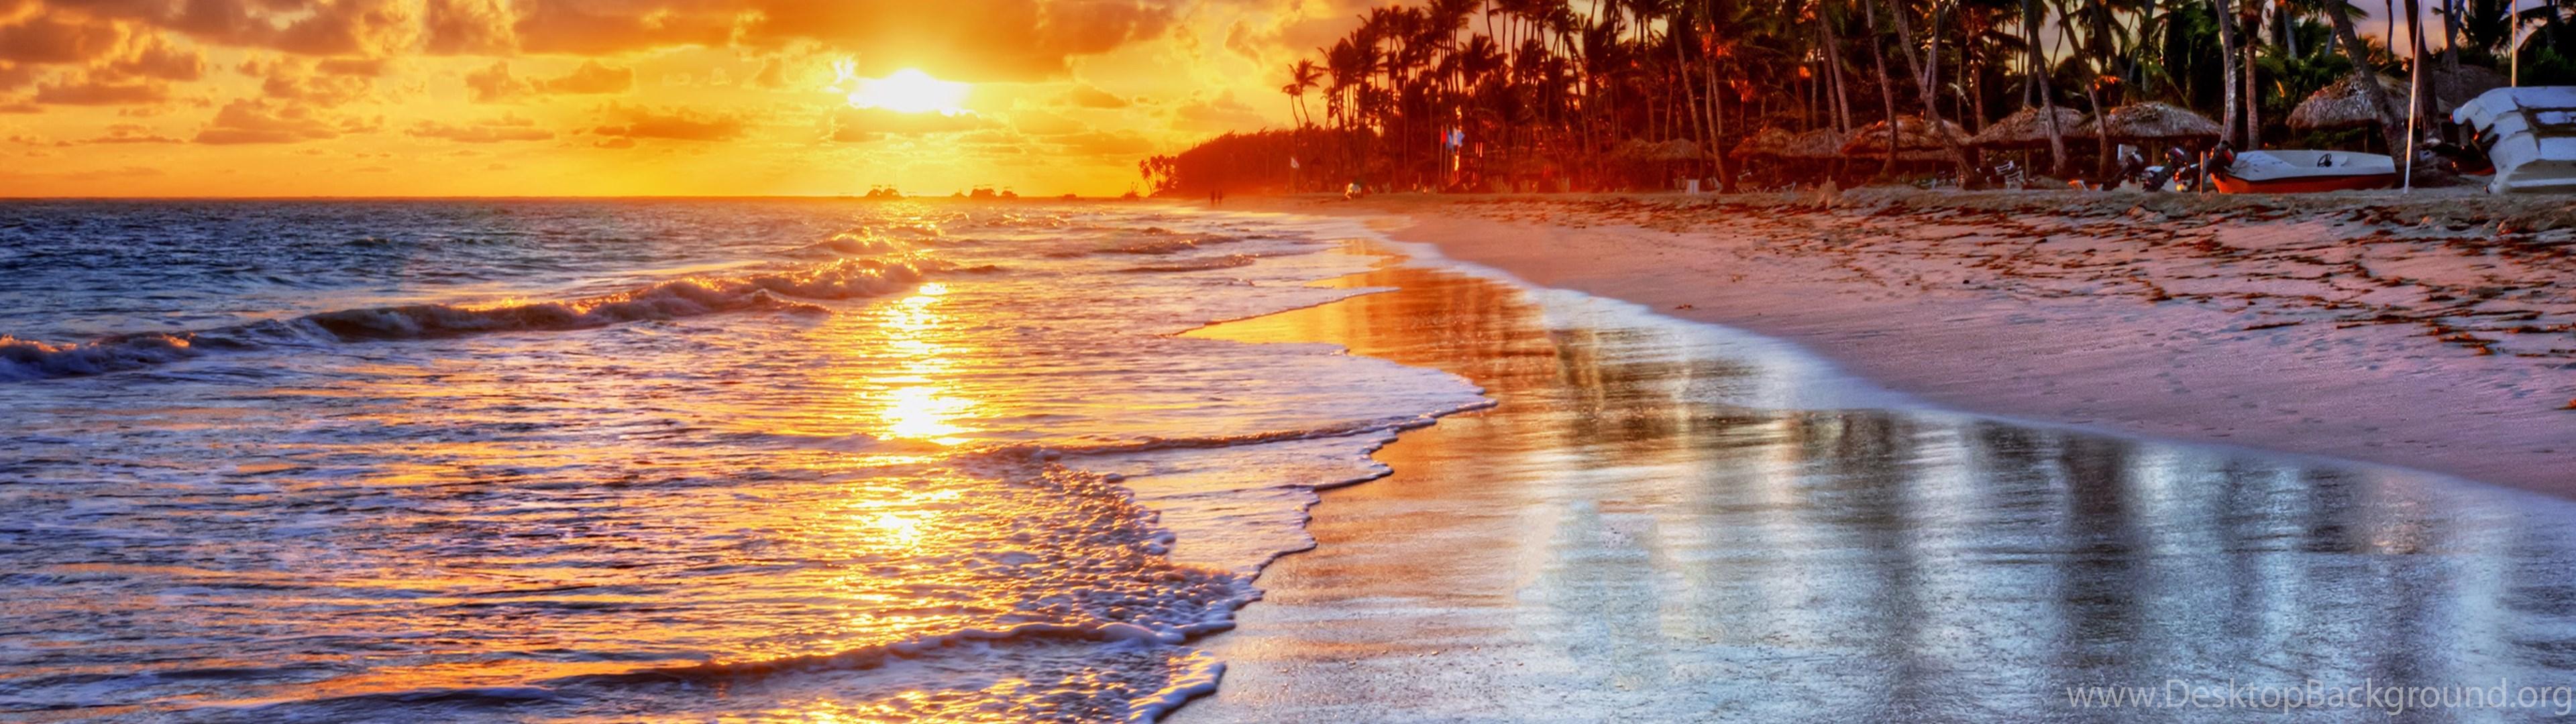 Sunset, Tropical, Ocean, Sand, Sea, Palms, Beach, Shore